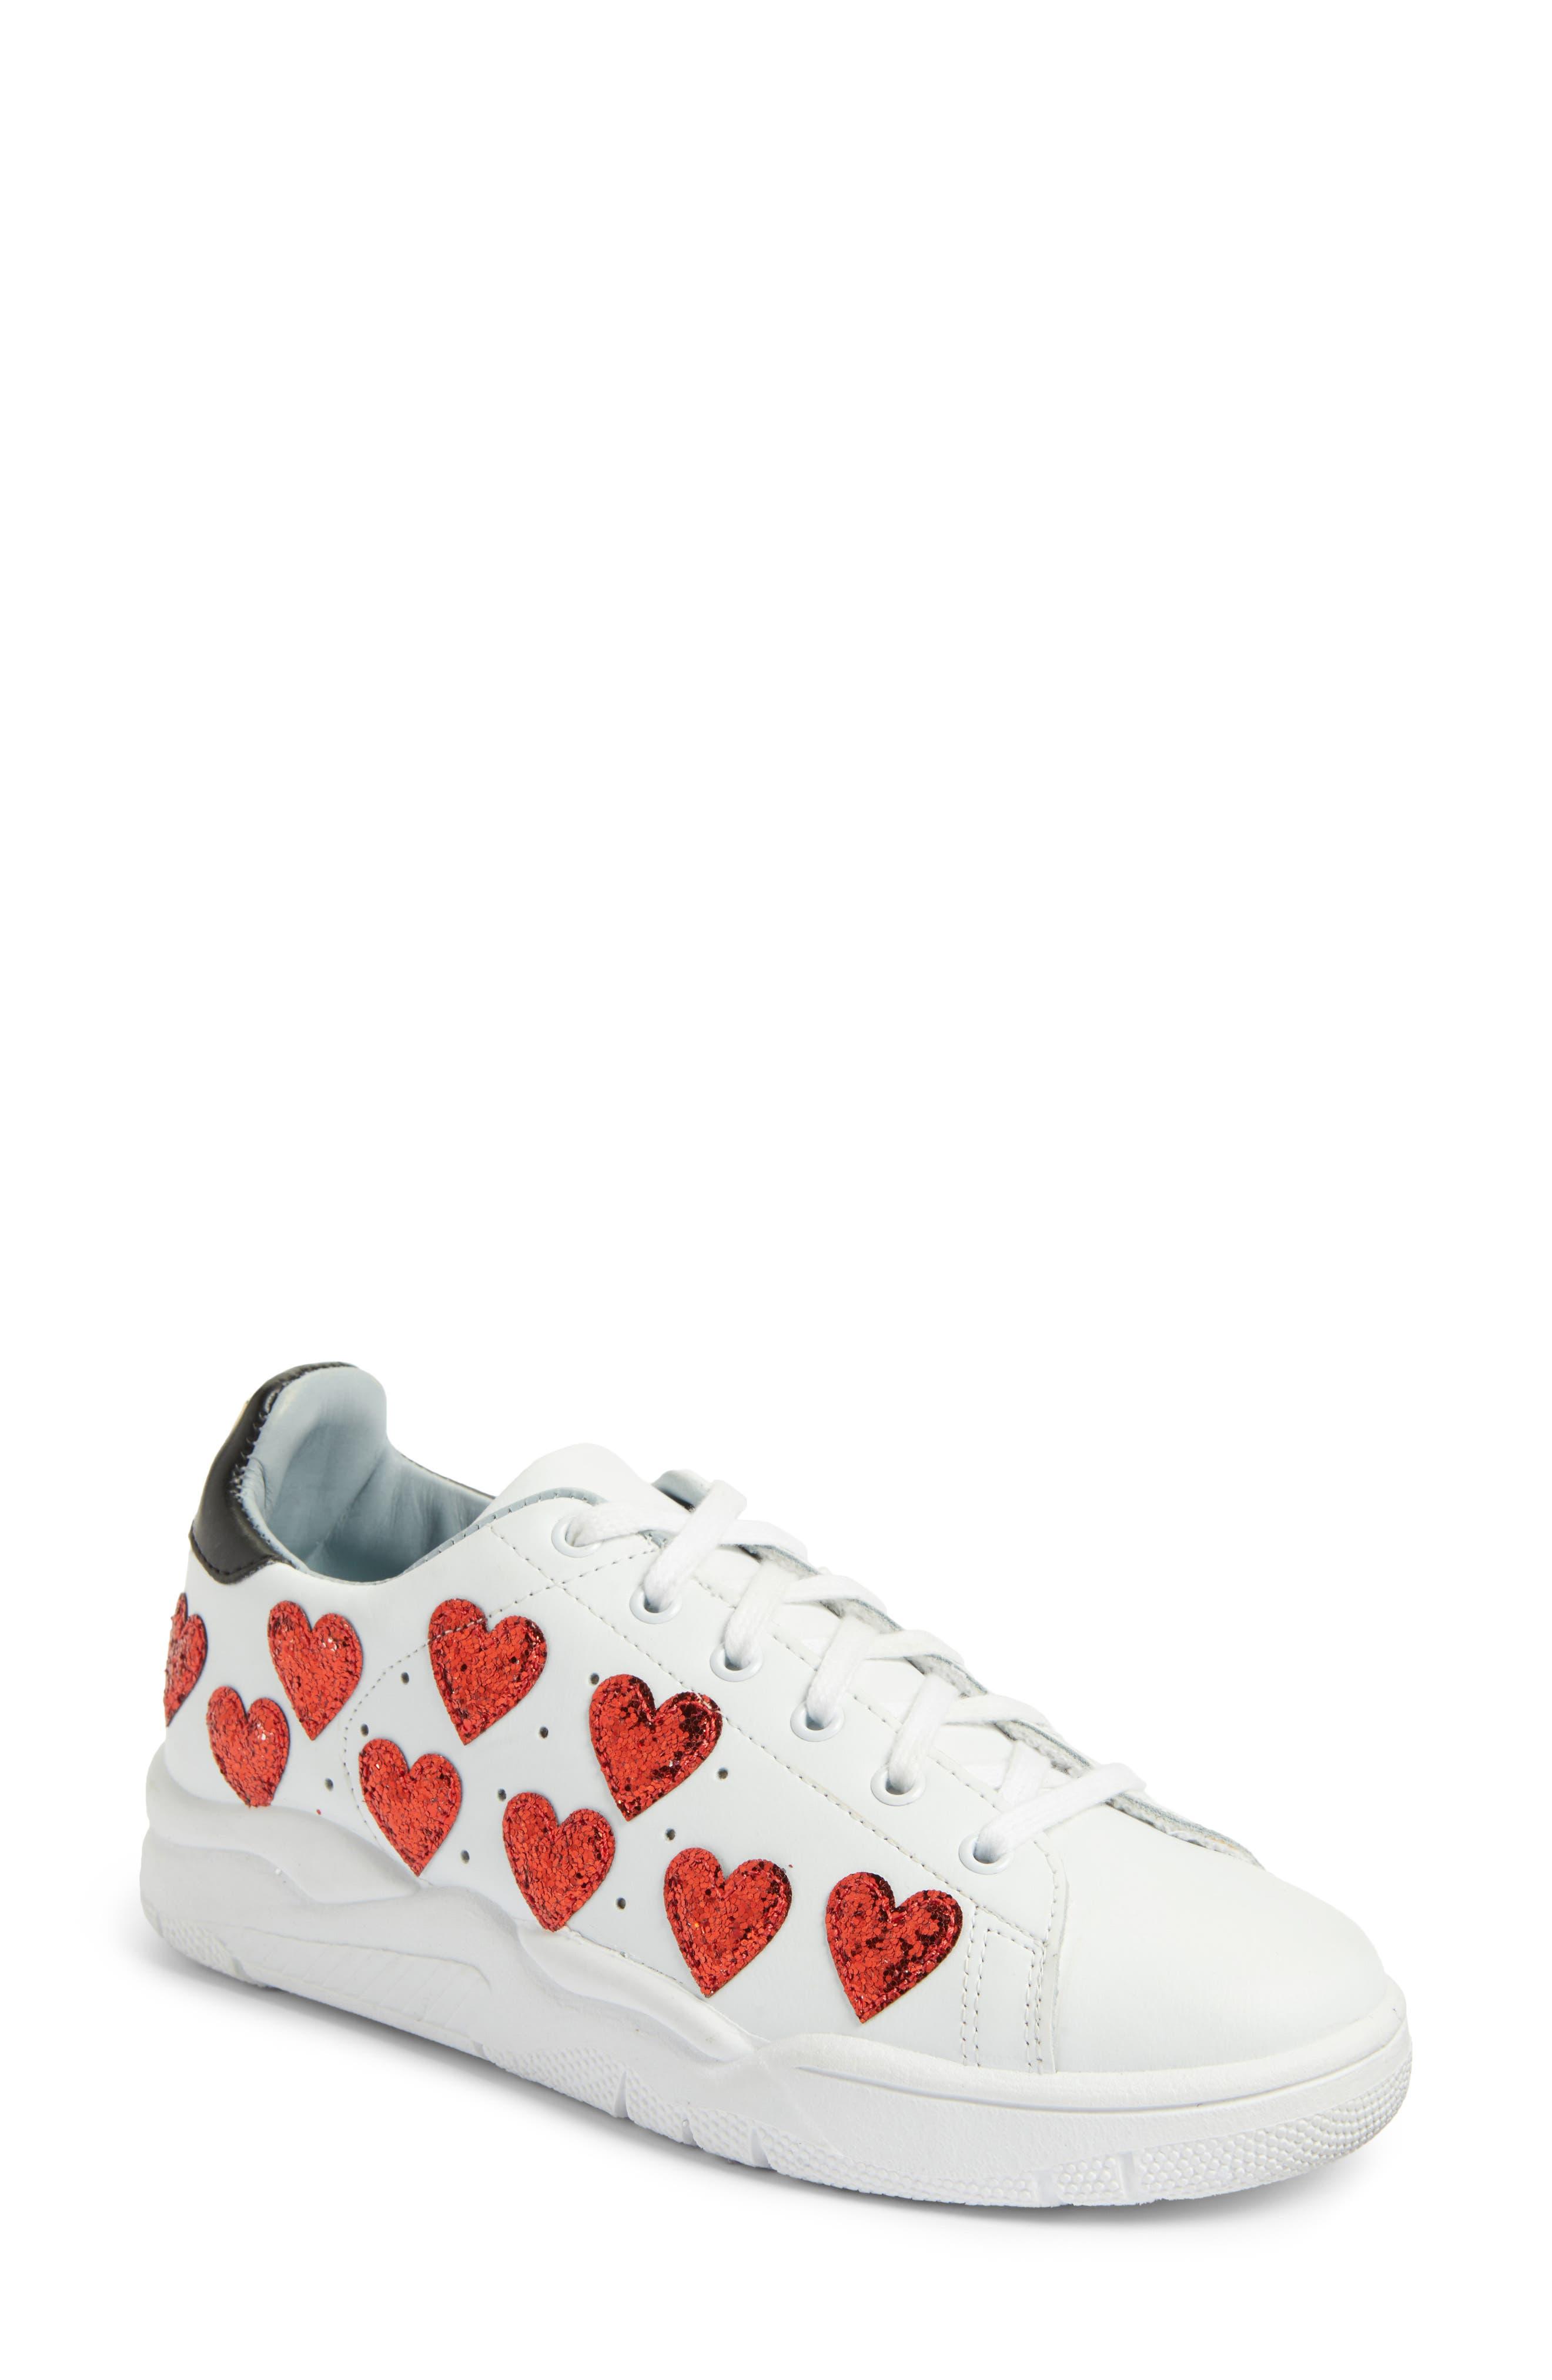 Hearts Roger Sneaker,                             Main thumbnail 1, color,                             102